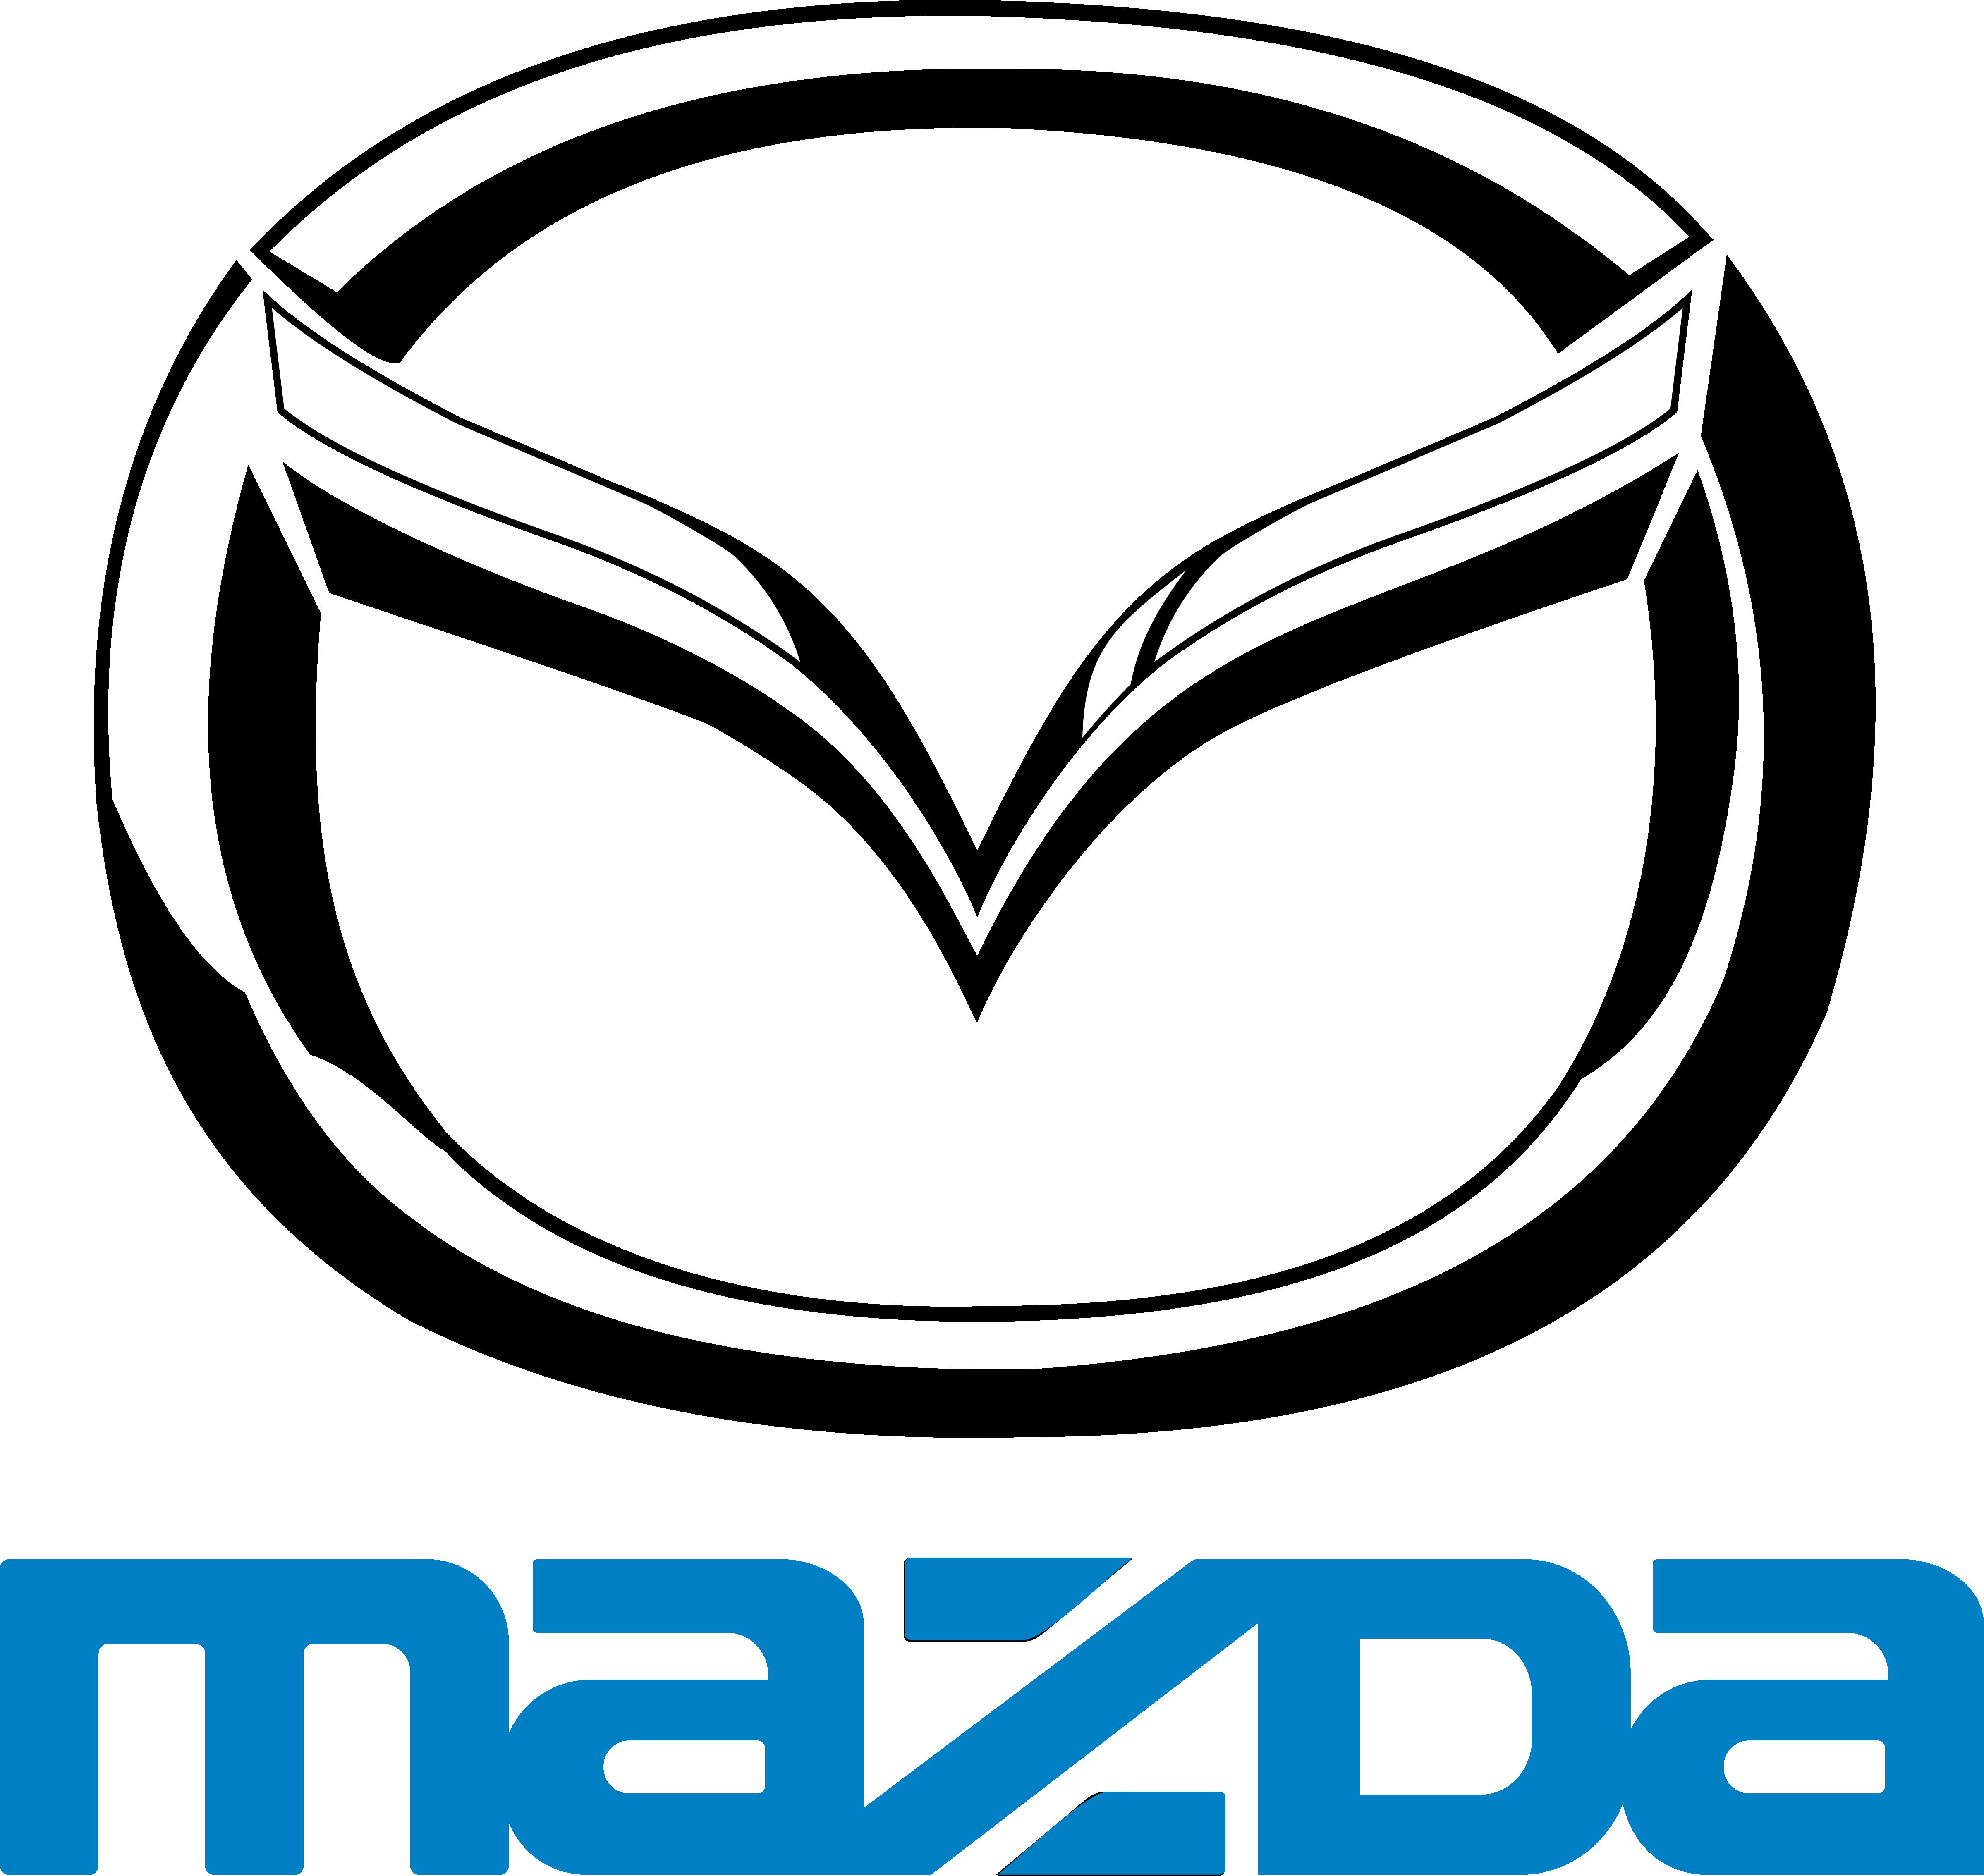 mazda logo png personalizado gratis